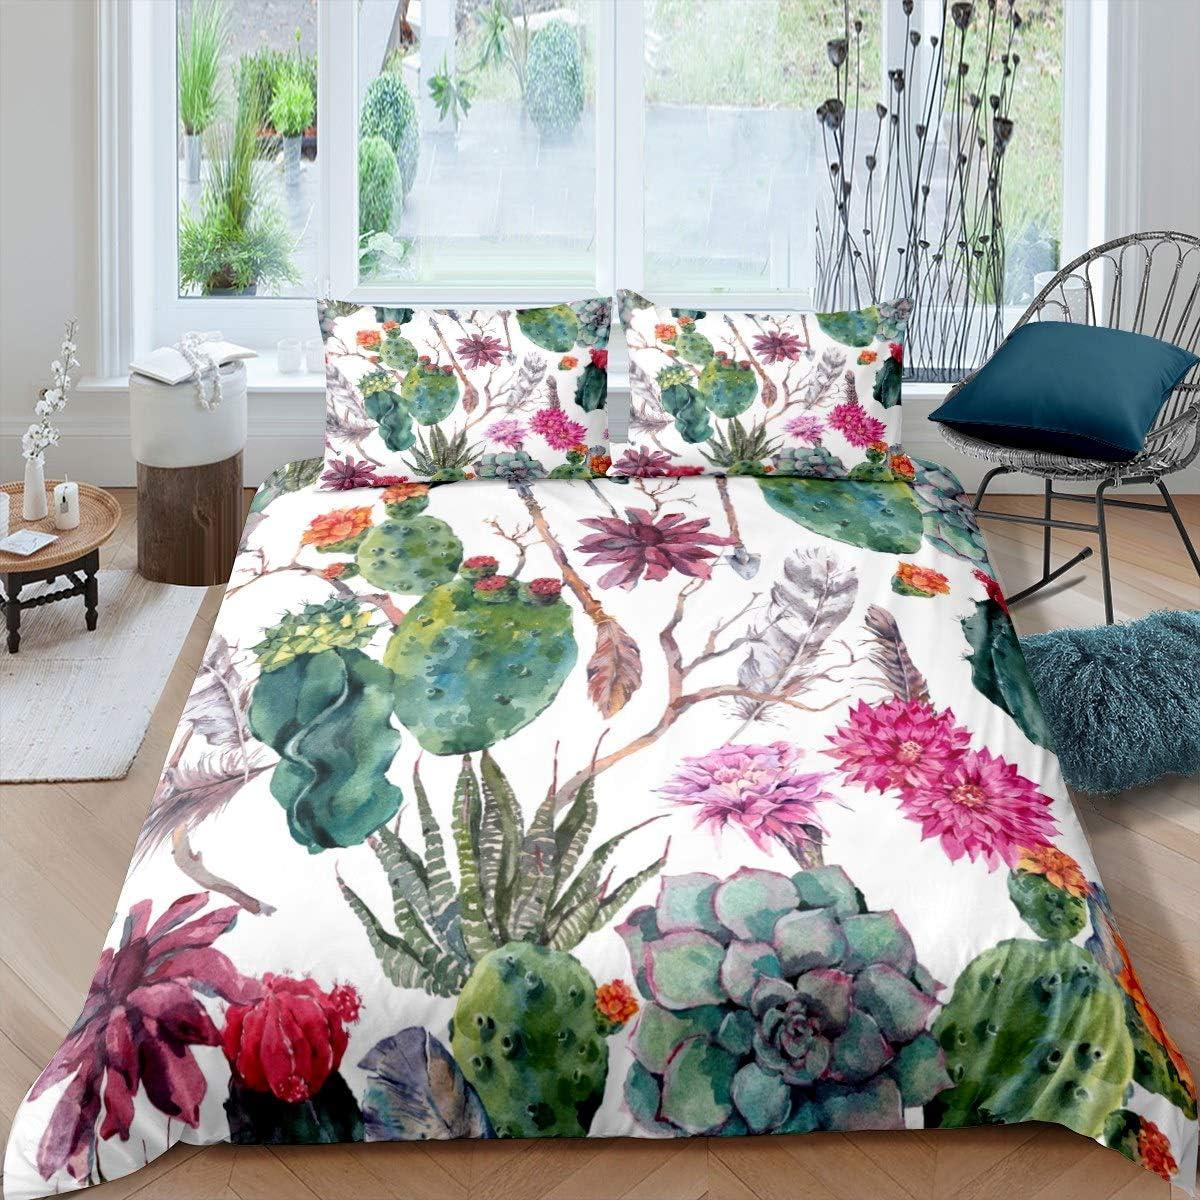 Feelyou Girls Cactus Printed Duvet Cover Boho Succulent Bedding Set for Daughter Women Bohemian Arrow Decor Comforter Cover Botanical Pattern Bedspread Cover 2Pcs Zipper Twin Size